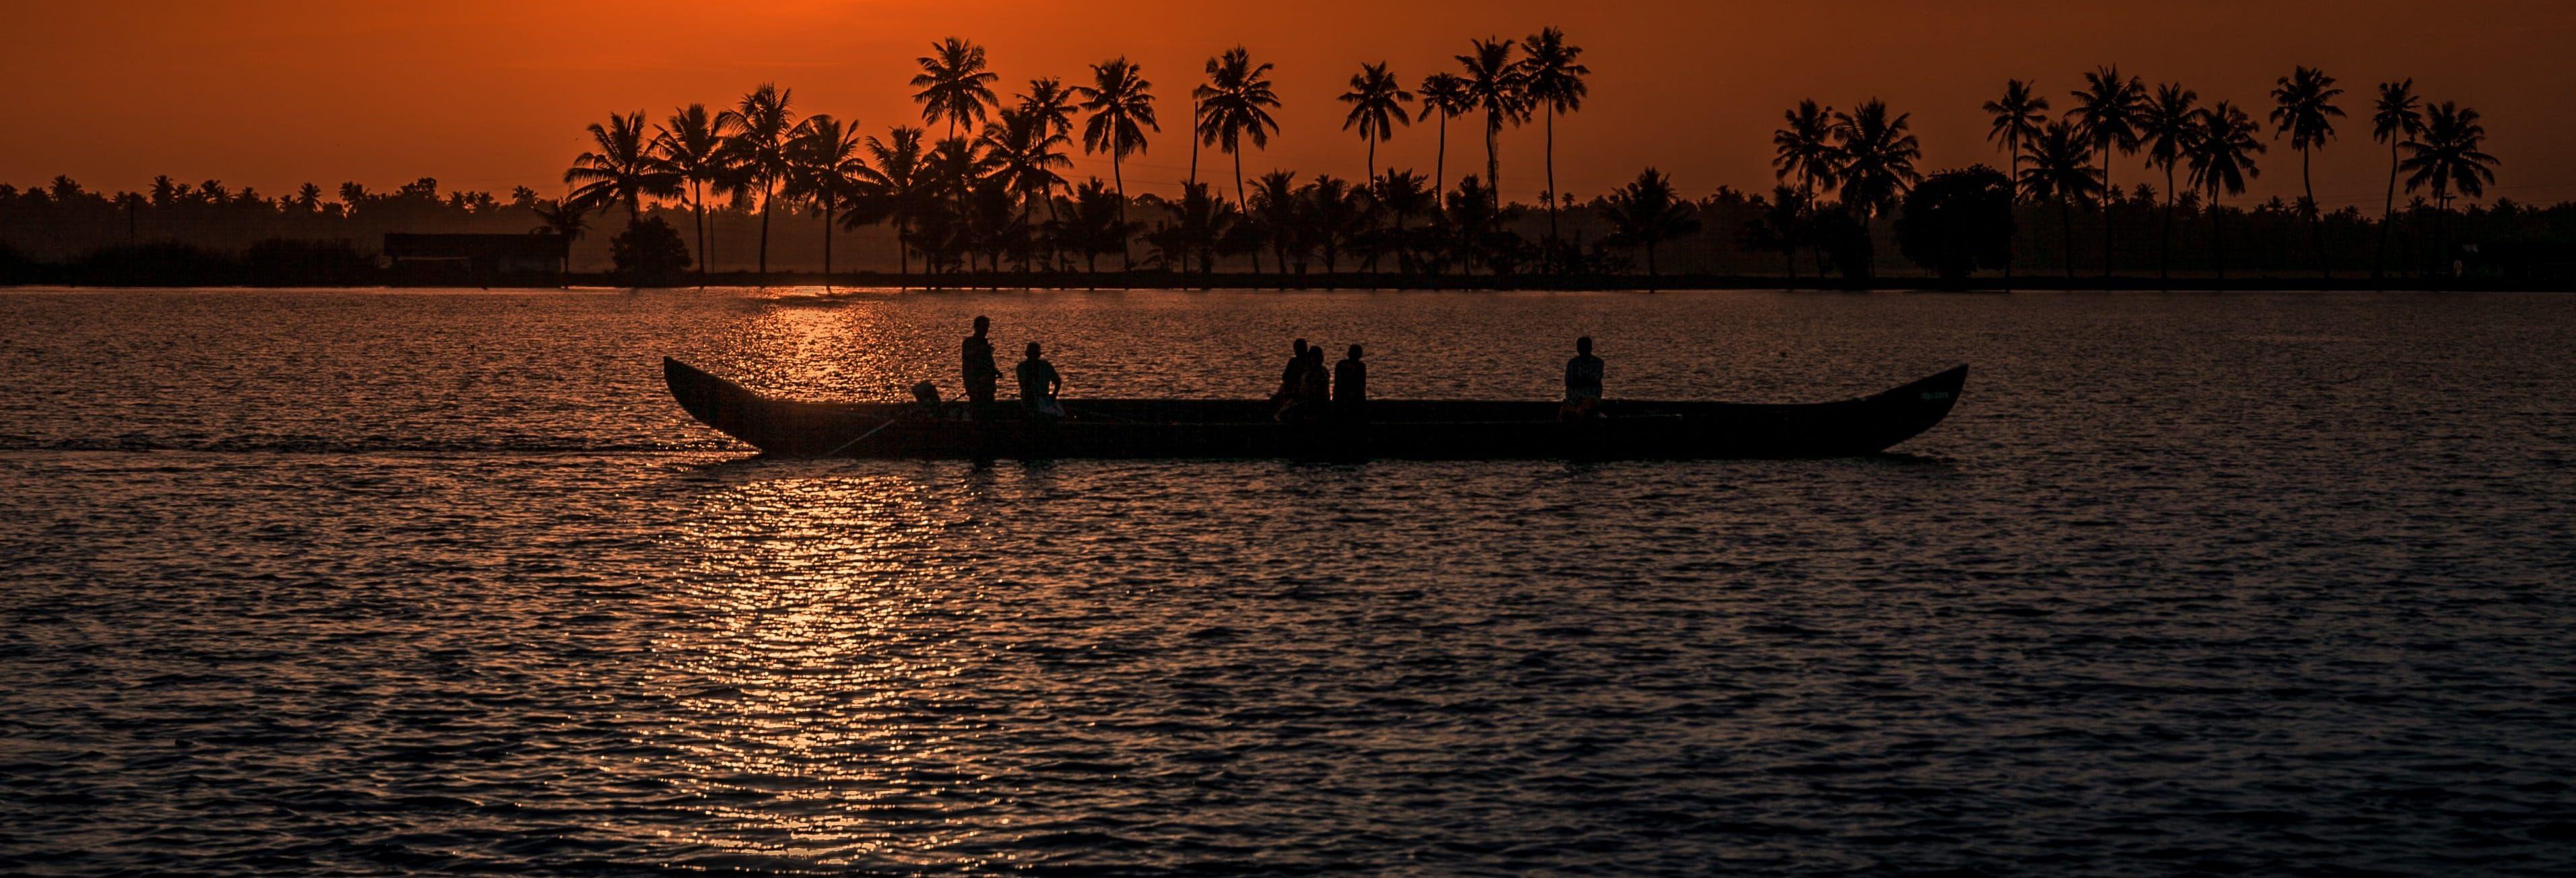 kerala-beach-sunset